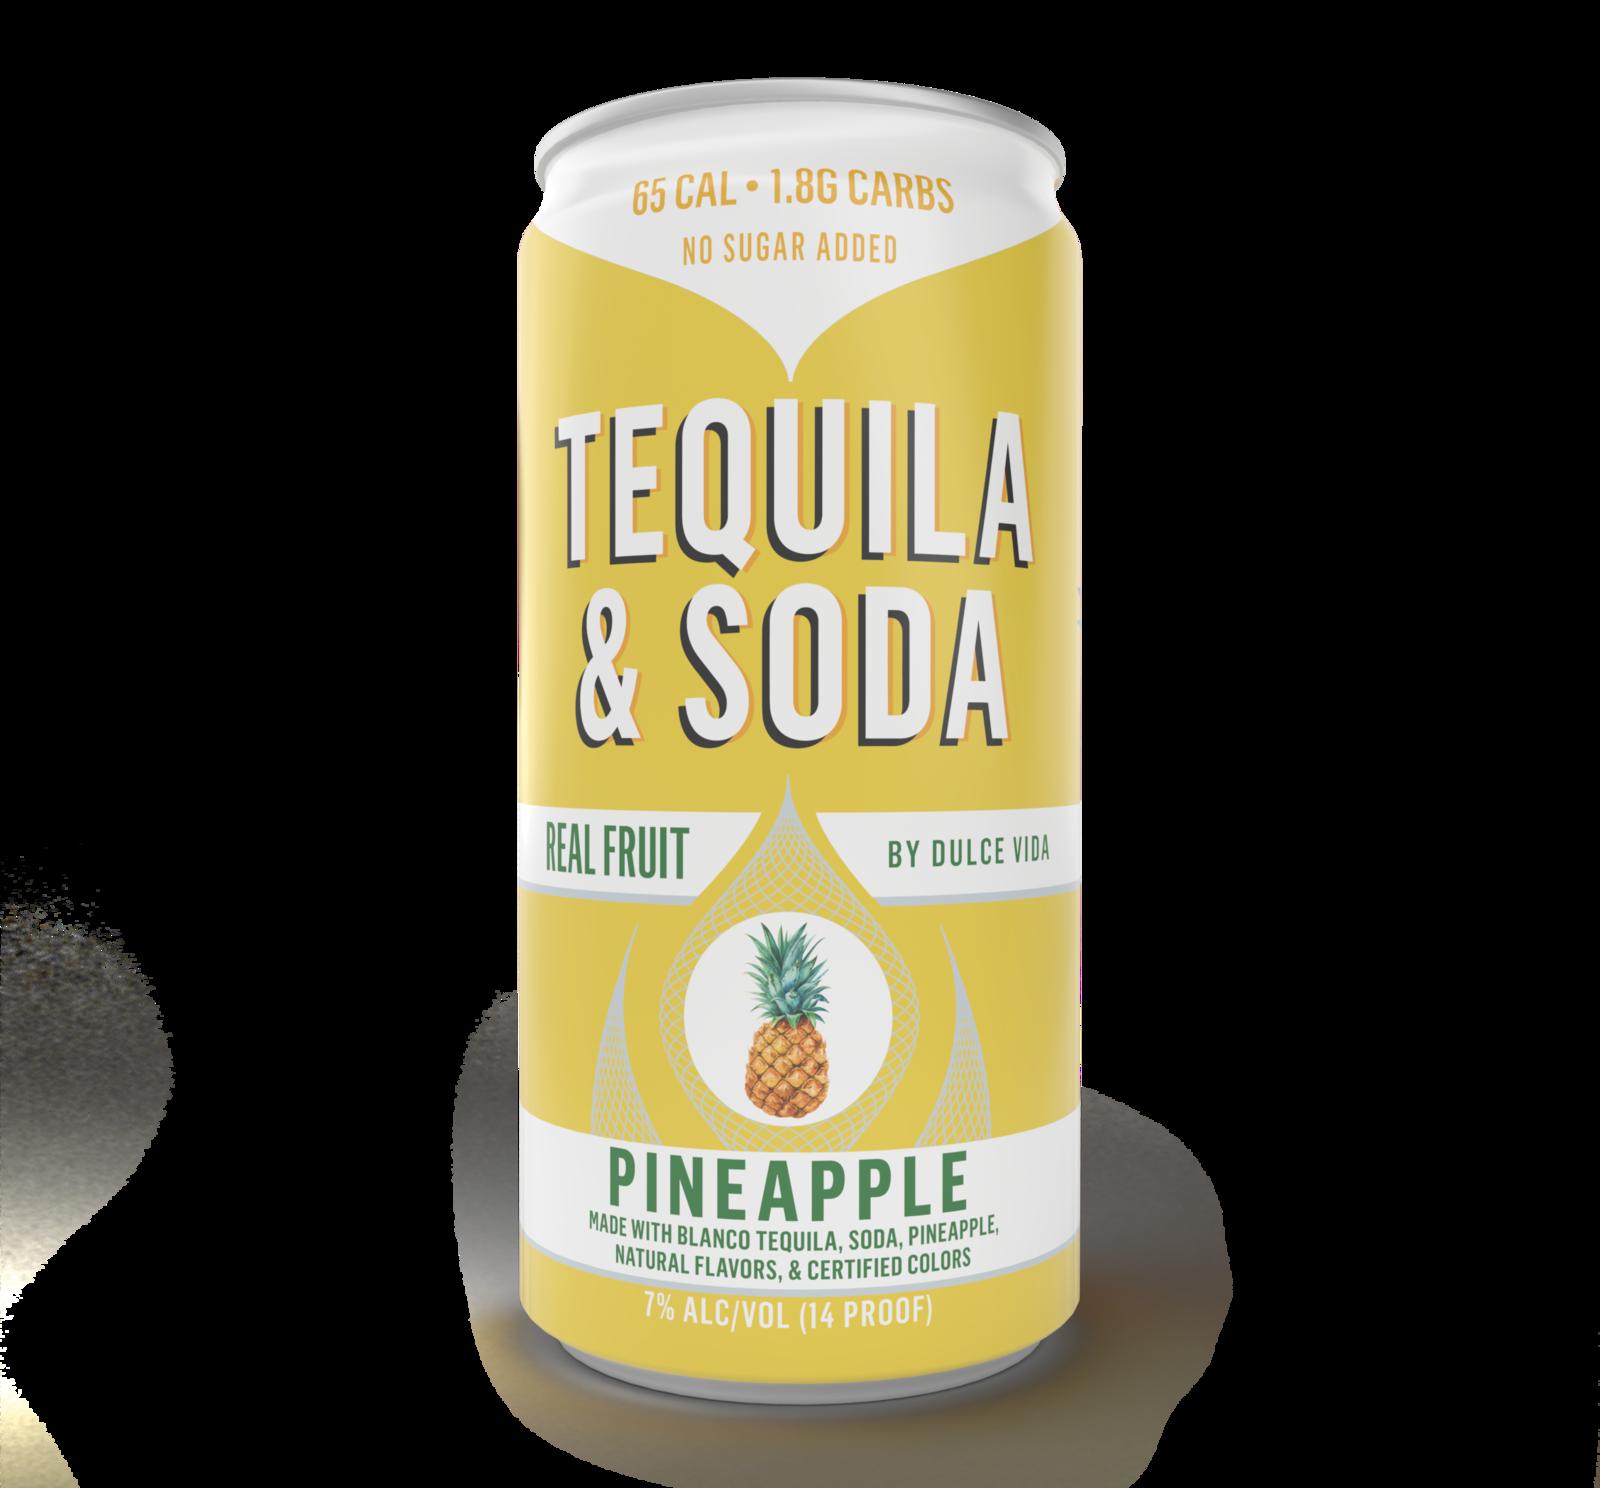 dv ts pineapple 21 01 08